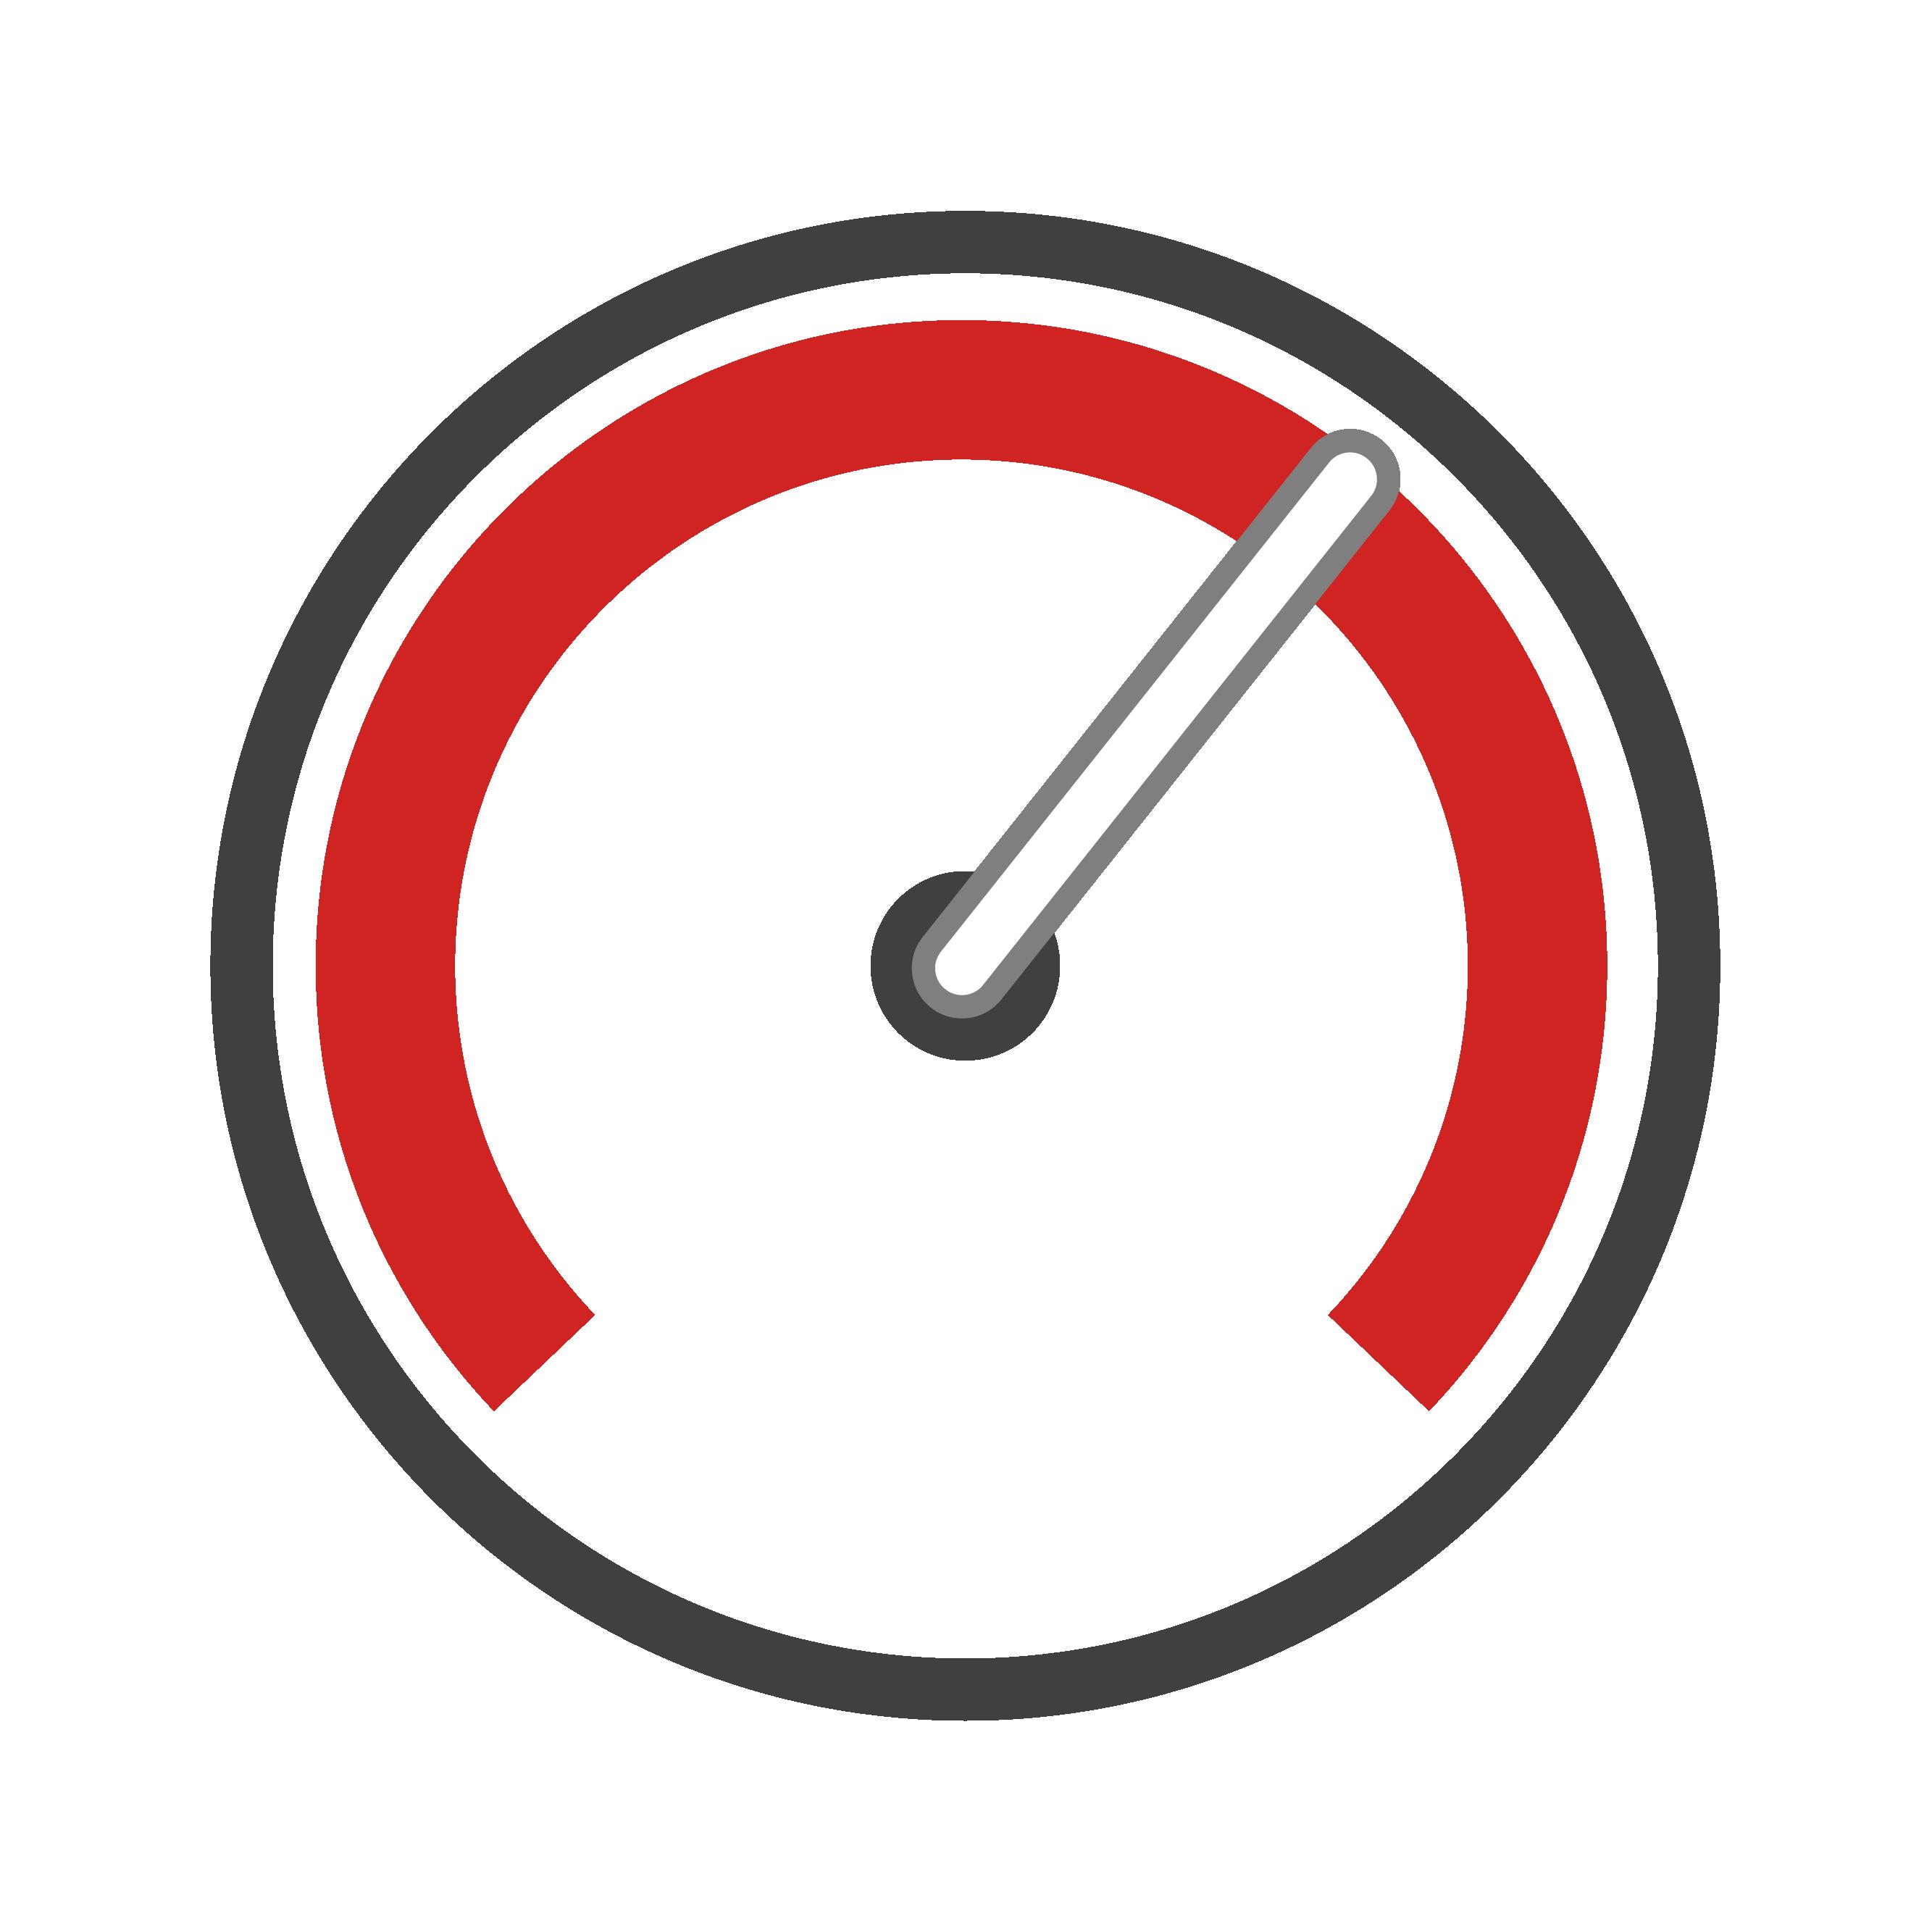 Controls Image